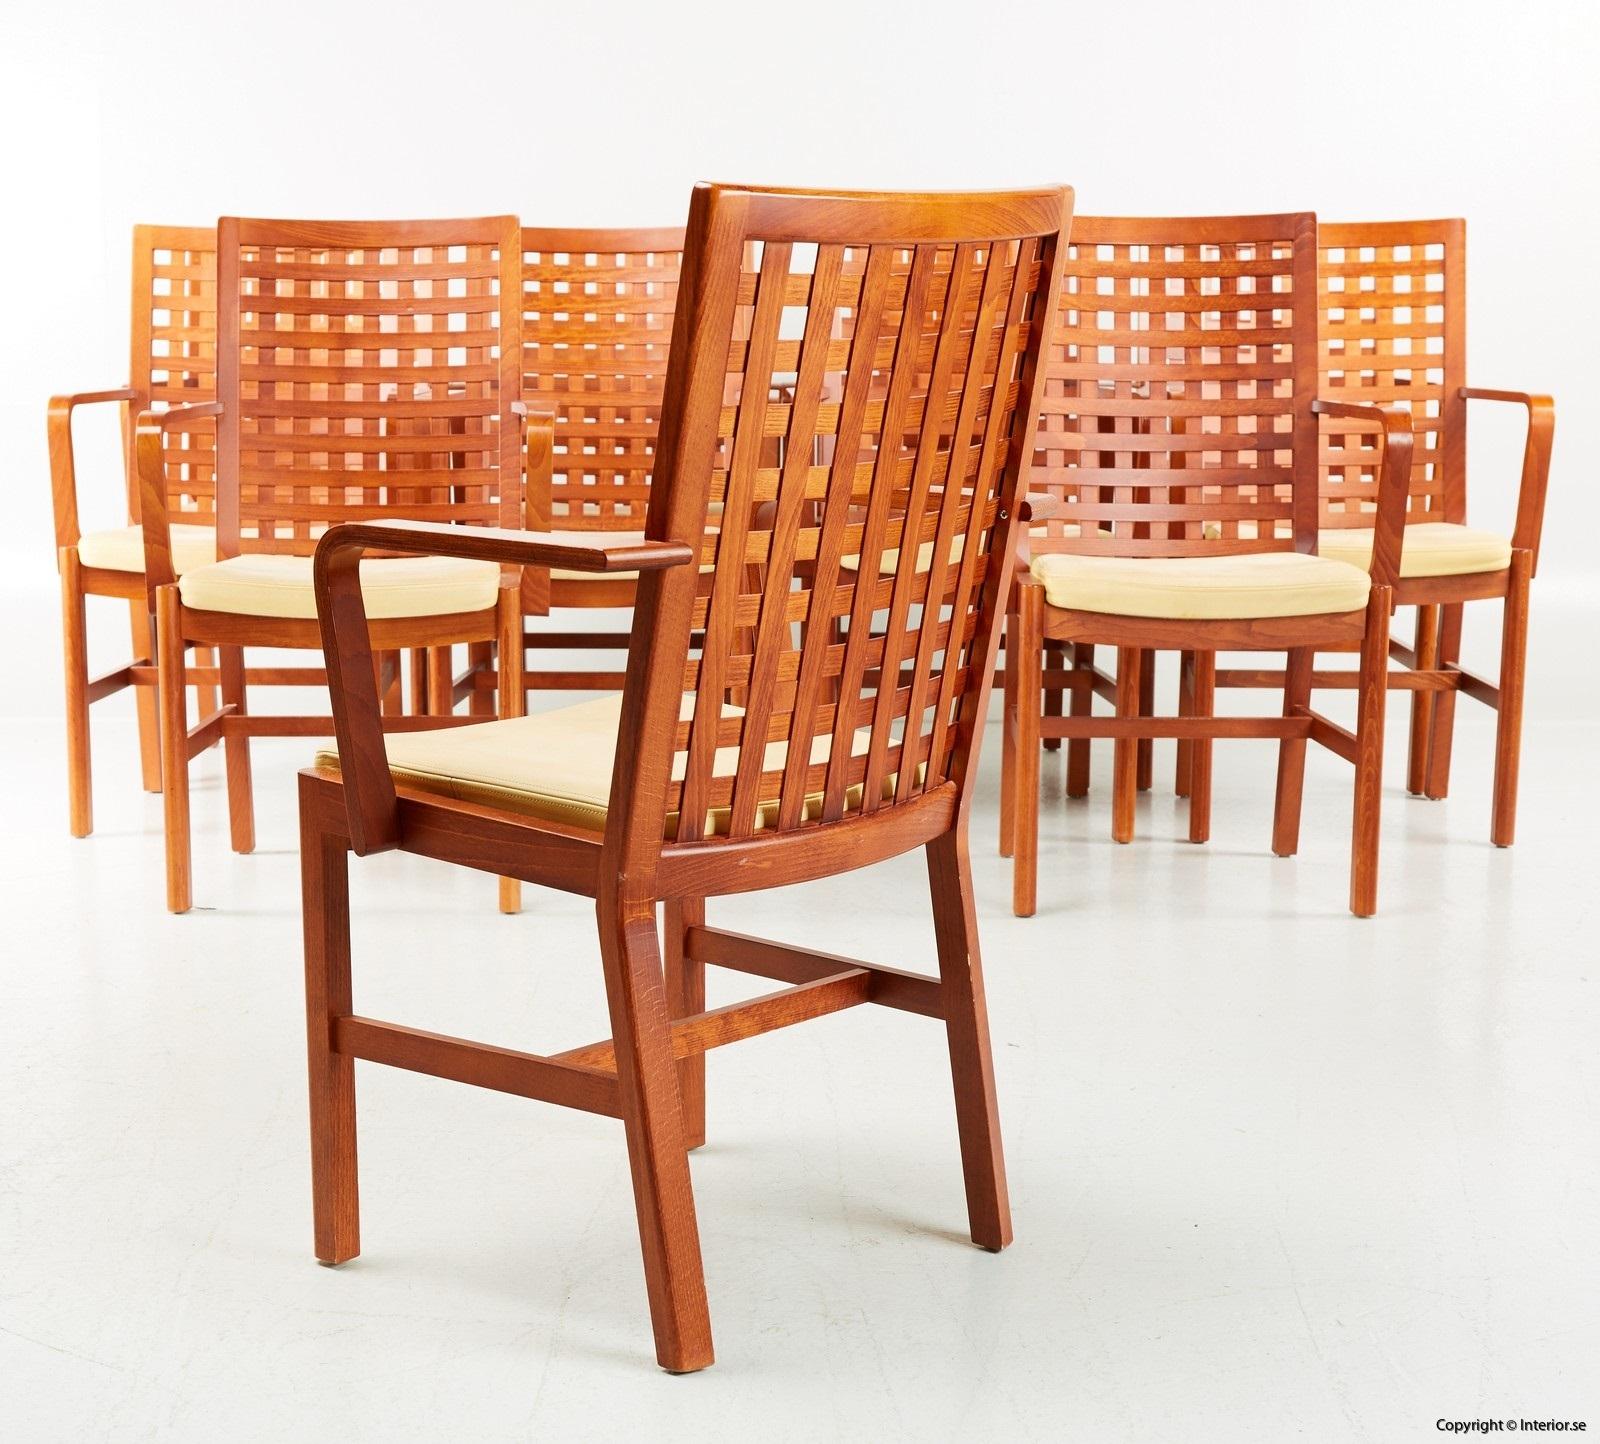 1 Konferensstolar Conference Chairs, Kvist Industries - Lädersits - Design furniture (5)